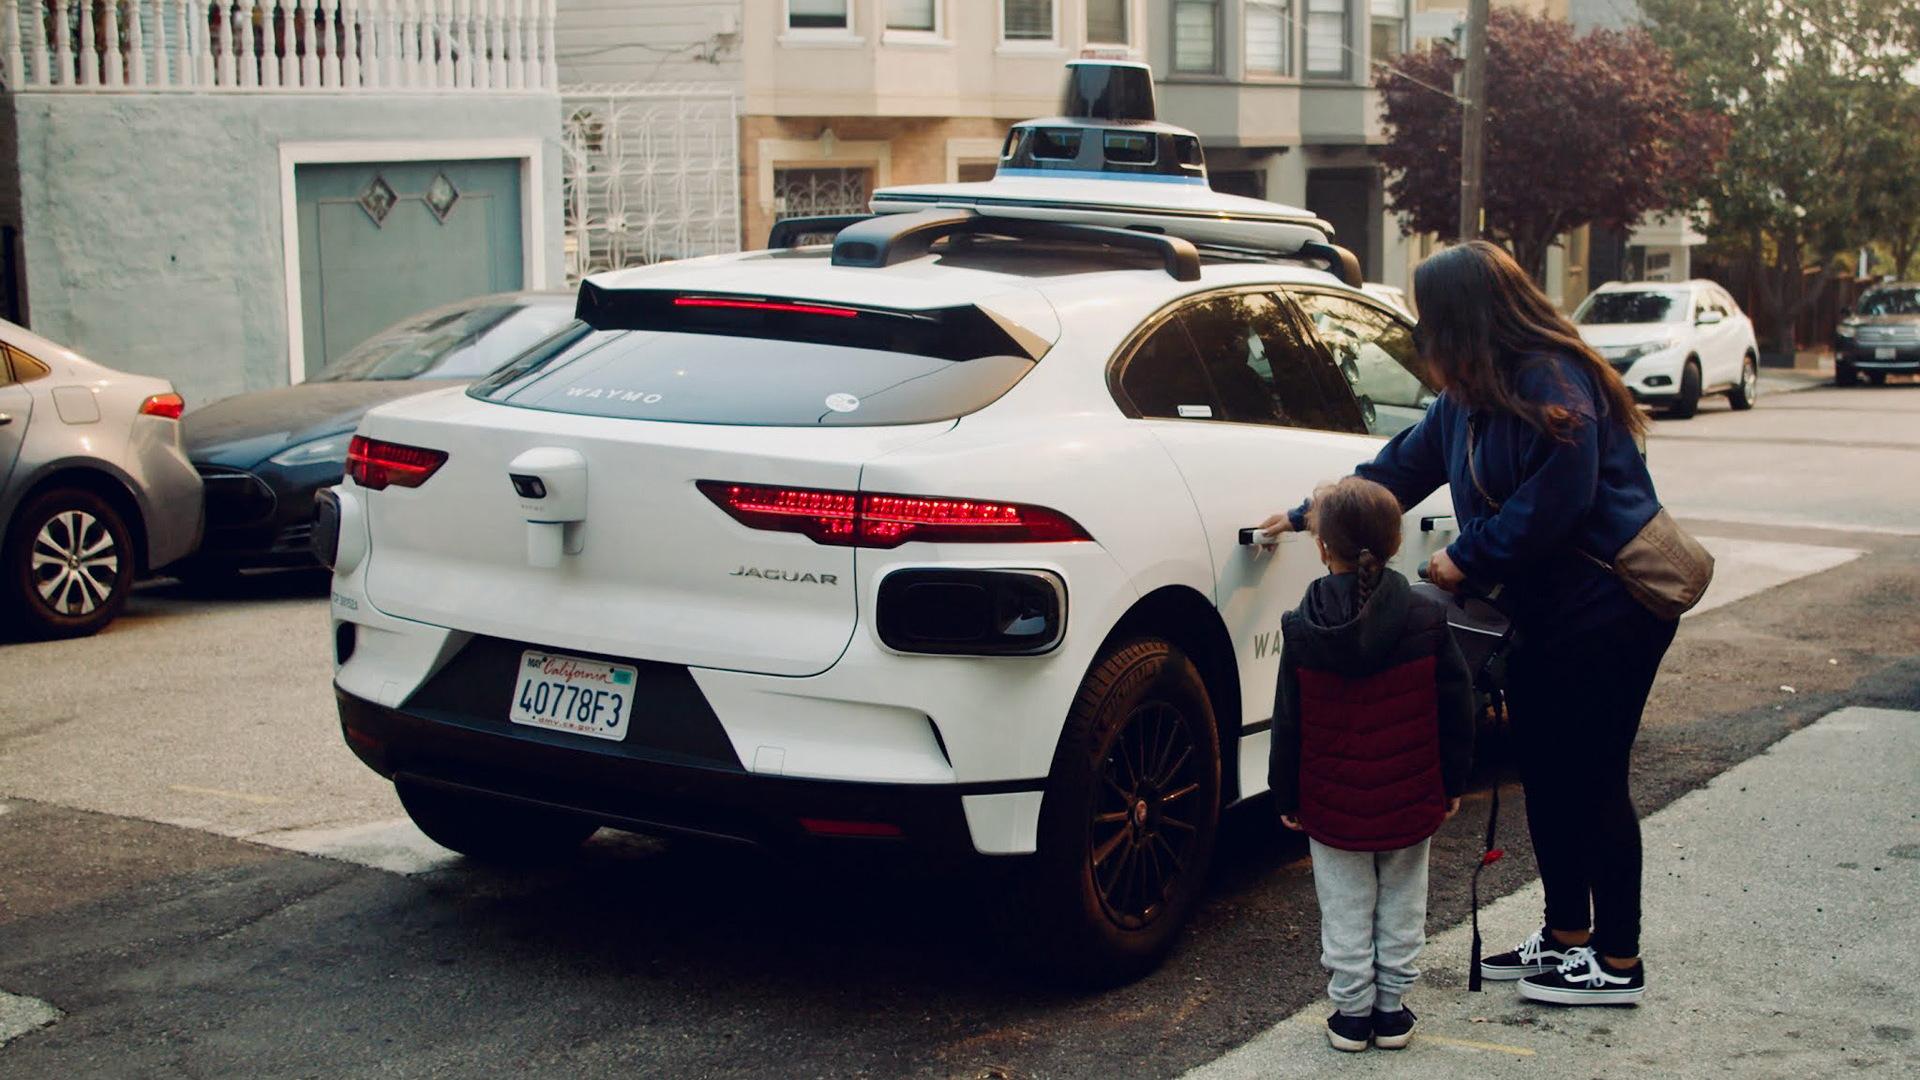 Waymo self-driving car prototype in San Francisco, California